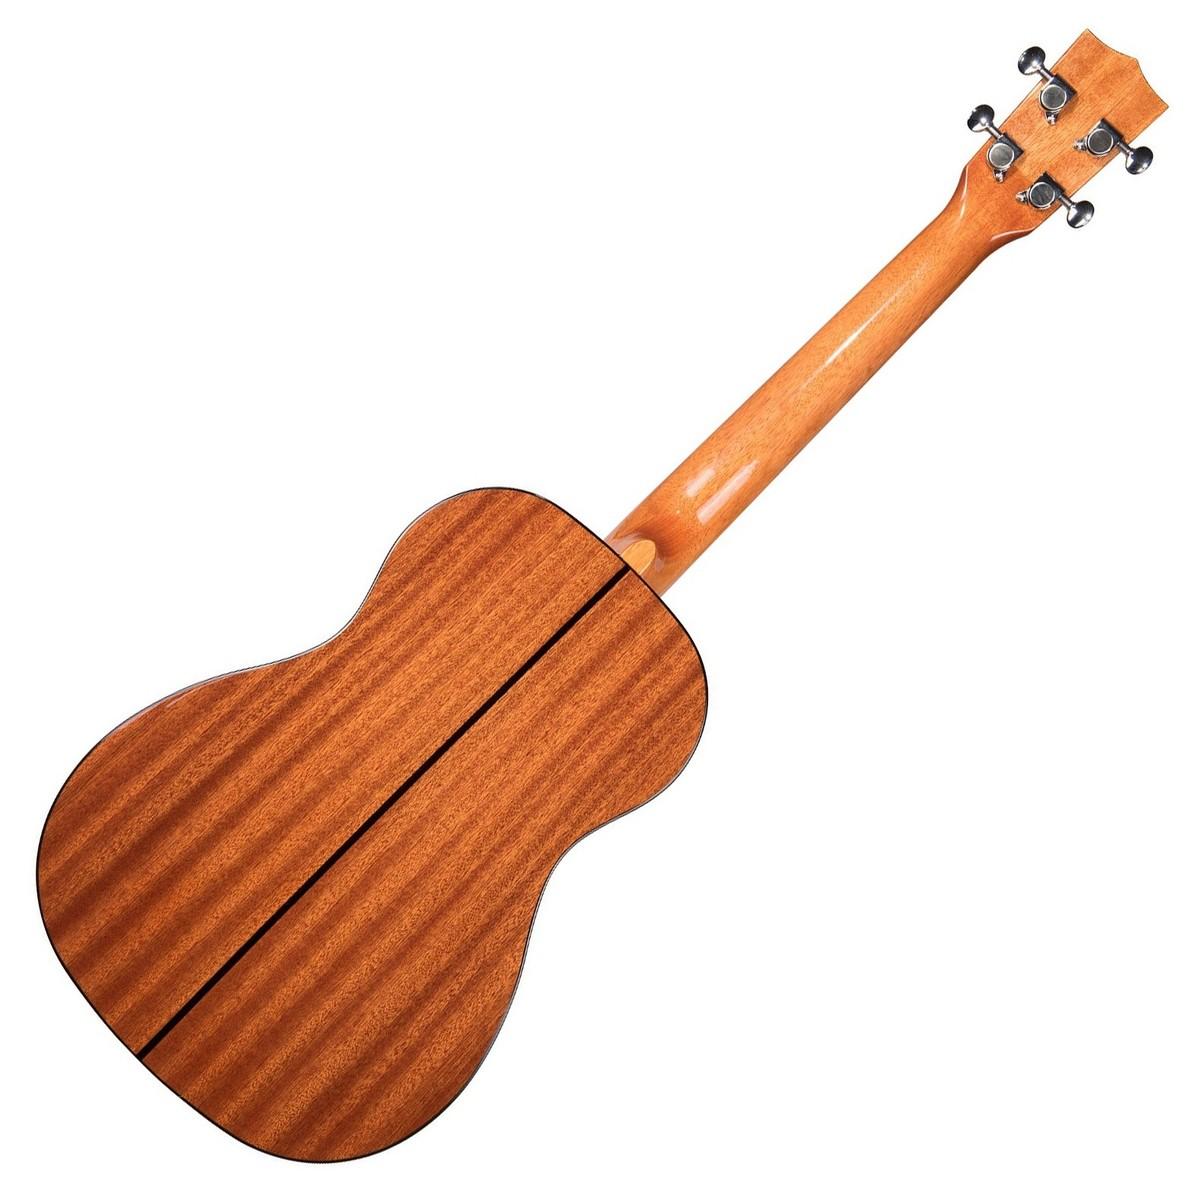 kala ka sbg baritone ukulele for sale red cow music york uk. Black Bedroom Furniture Sets. Home Design Ideas